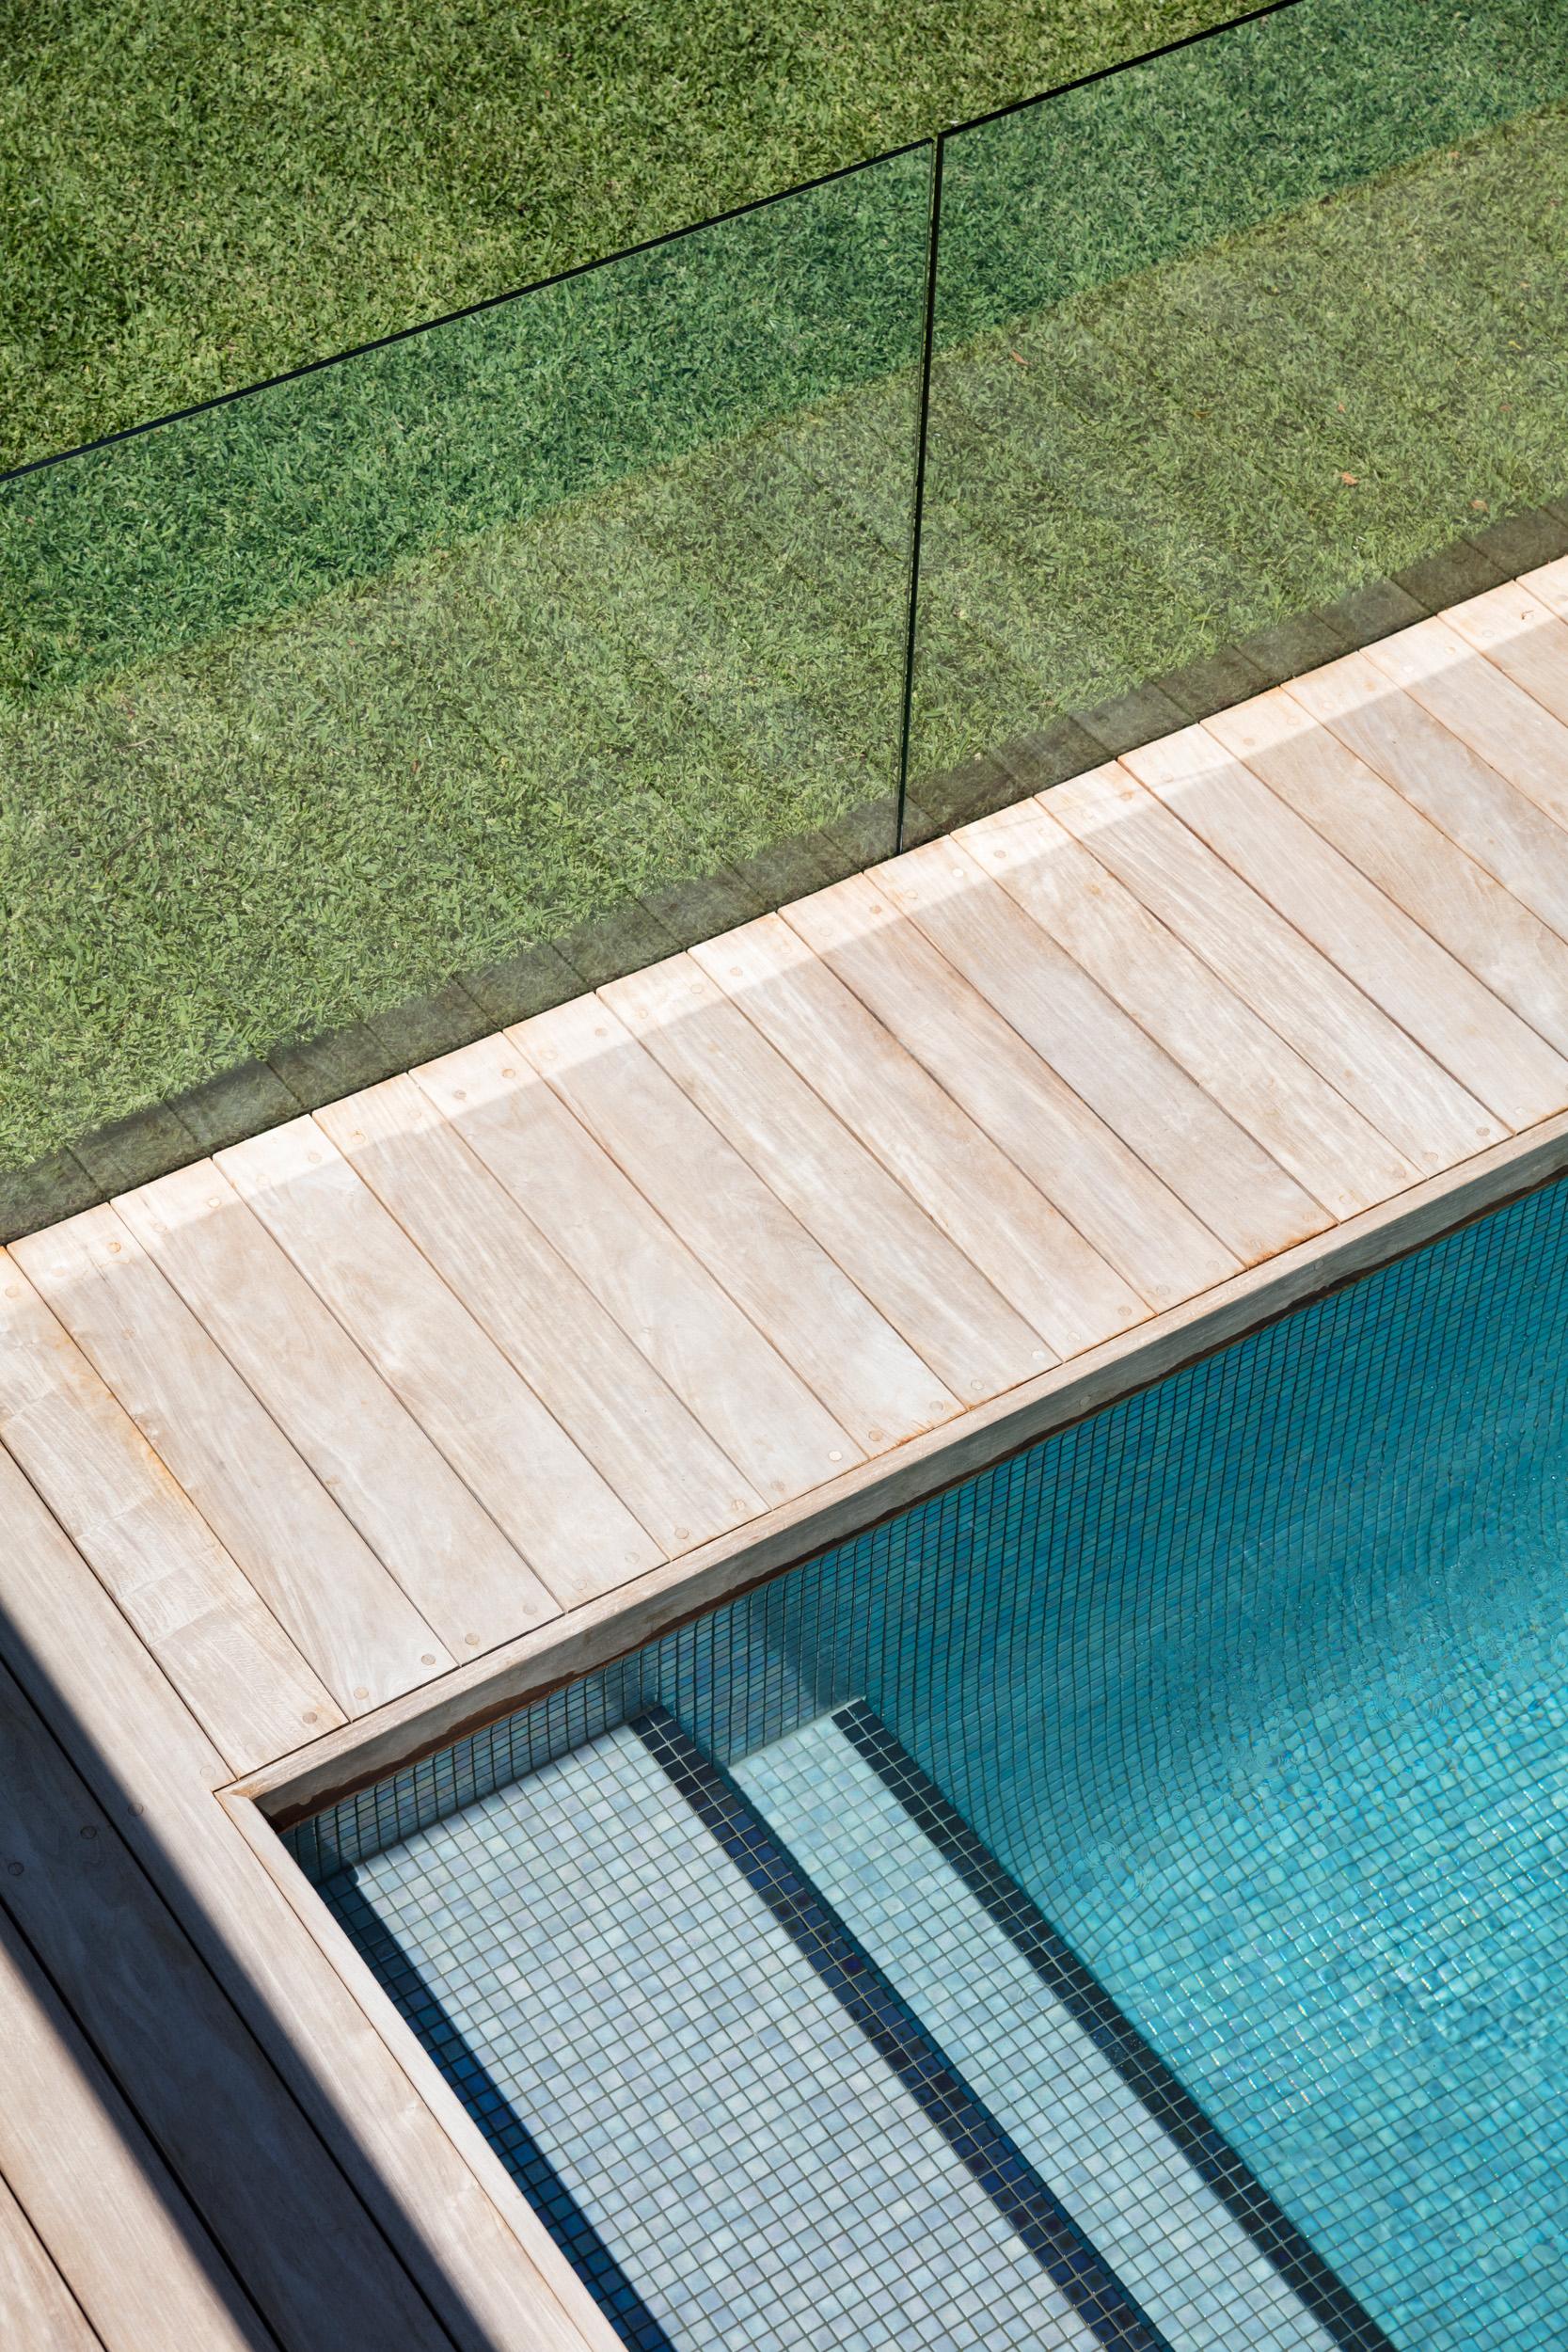 Jem_Cresswell_Architecture_Residential_Photographer_Sydney_Australia_038.jpg